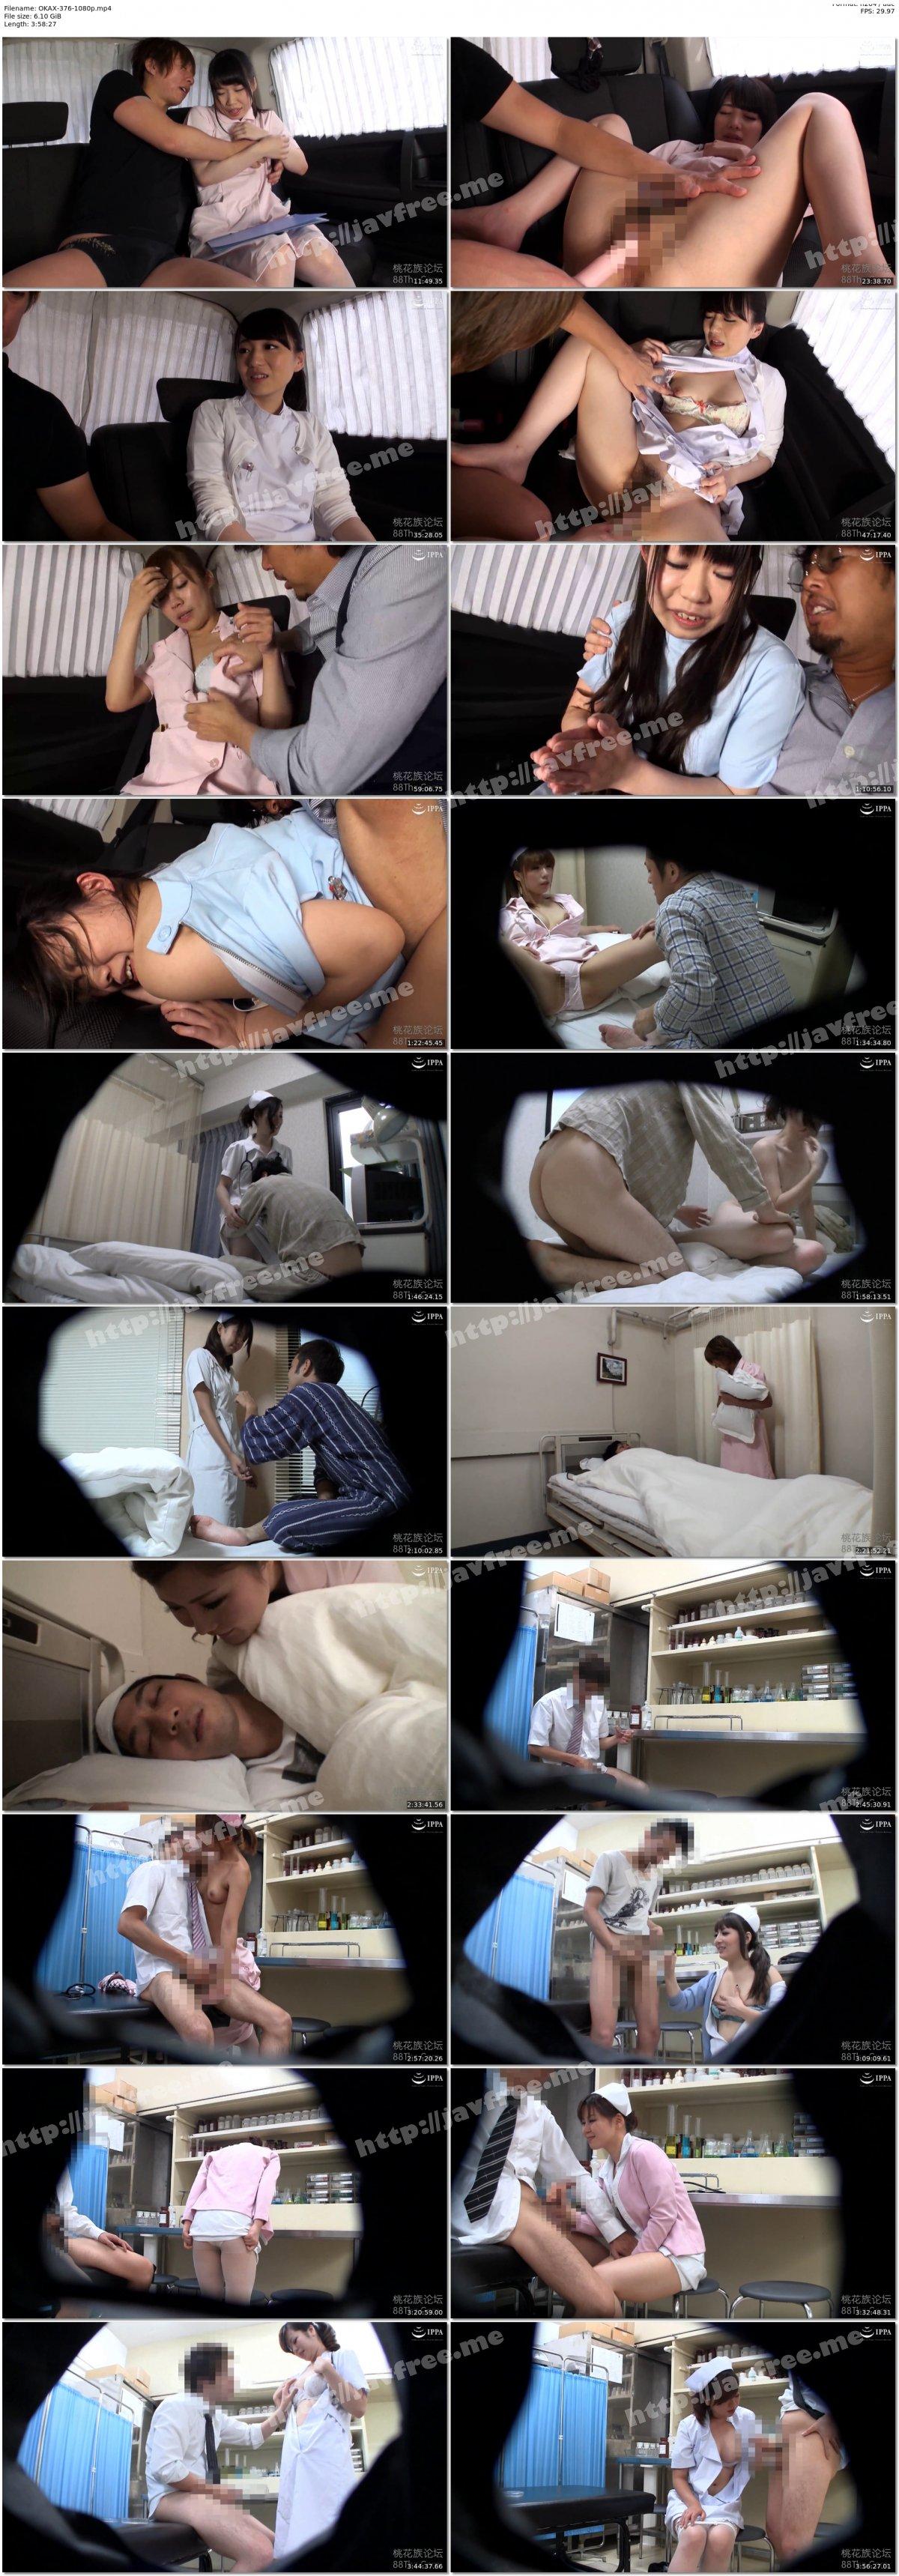 [HD][OKAX-376] ナースを仕事中に口説いて病院の敷地内でセックスできるか?4時間